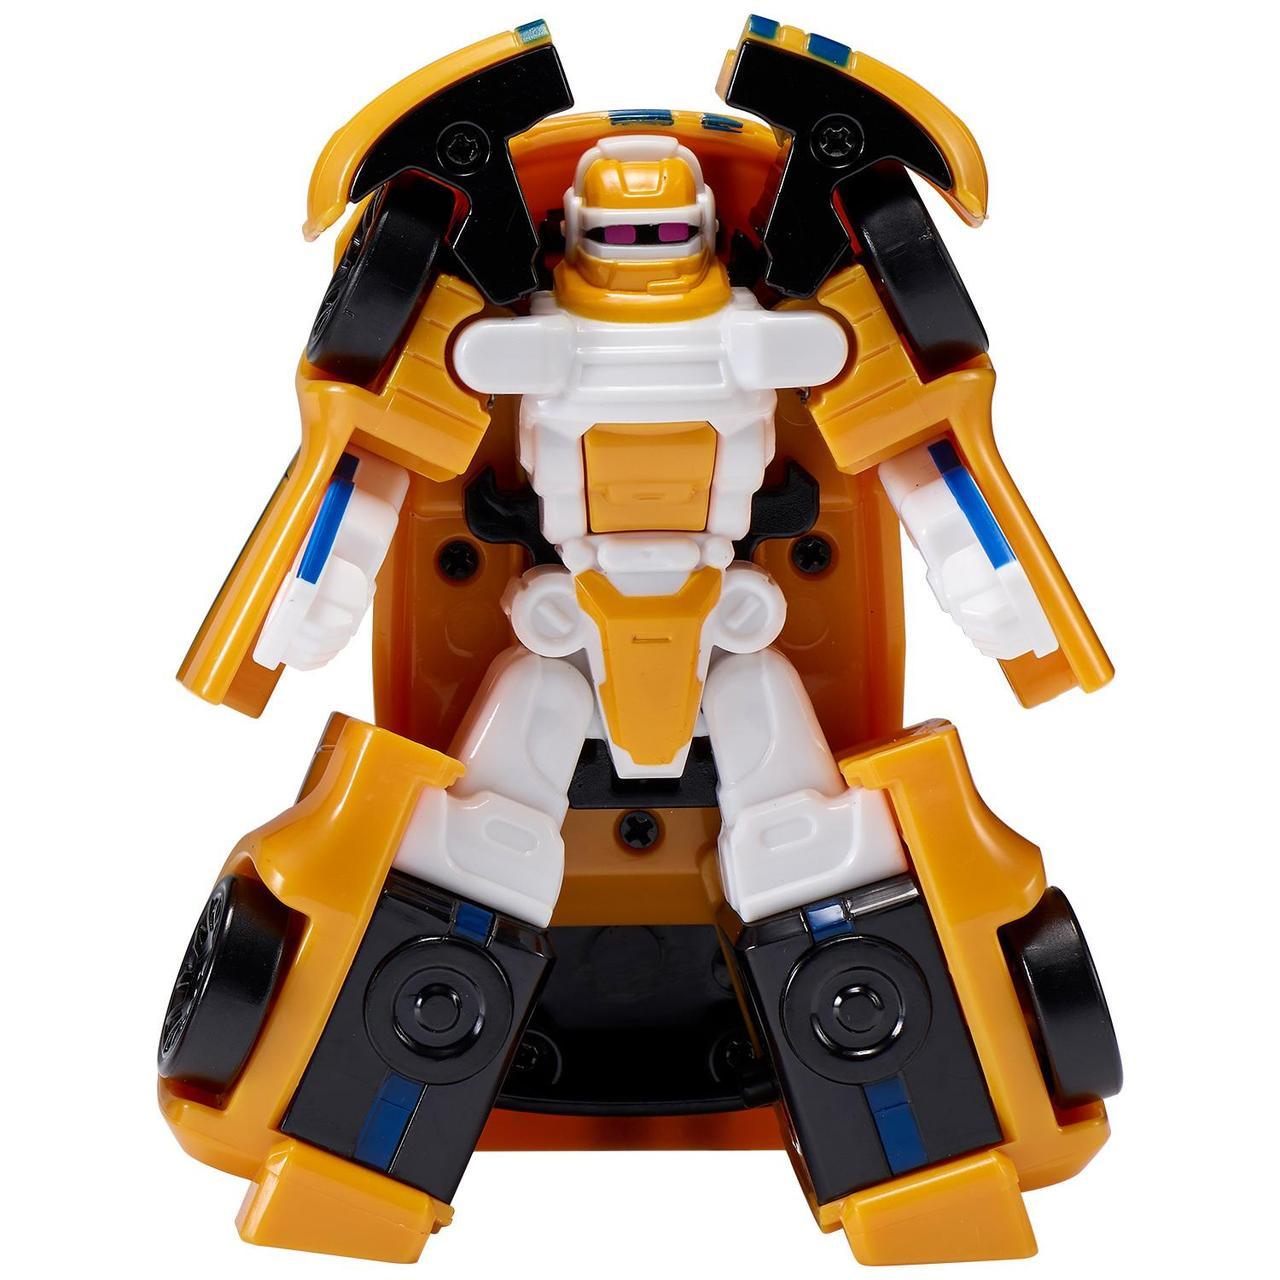 "Tobot Робот-трансформер Тобот Атлон Тета S1 ""Мини"""